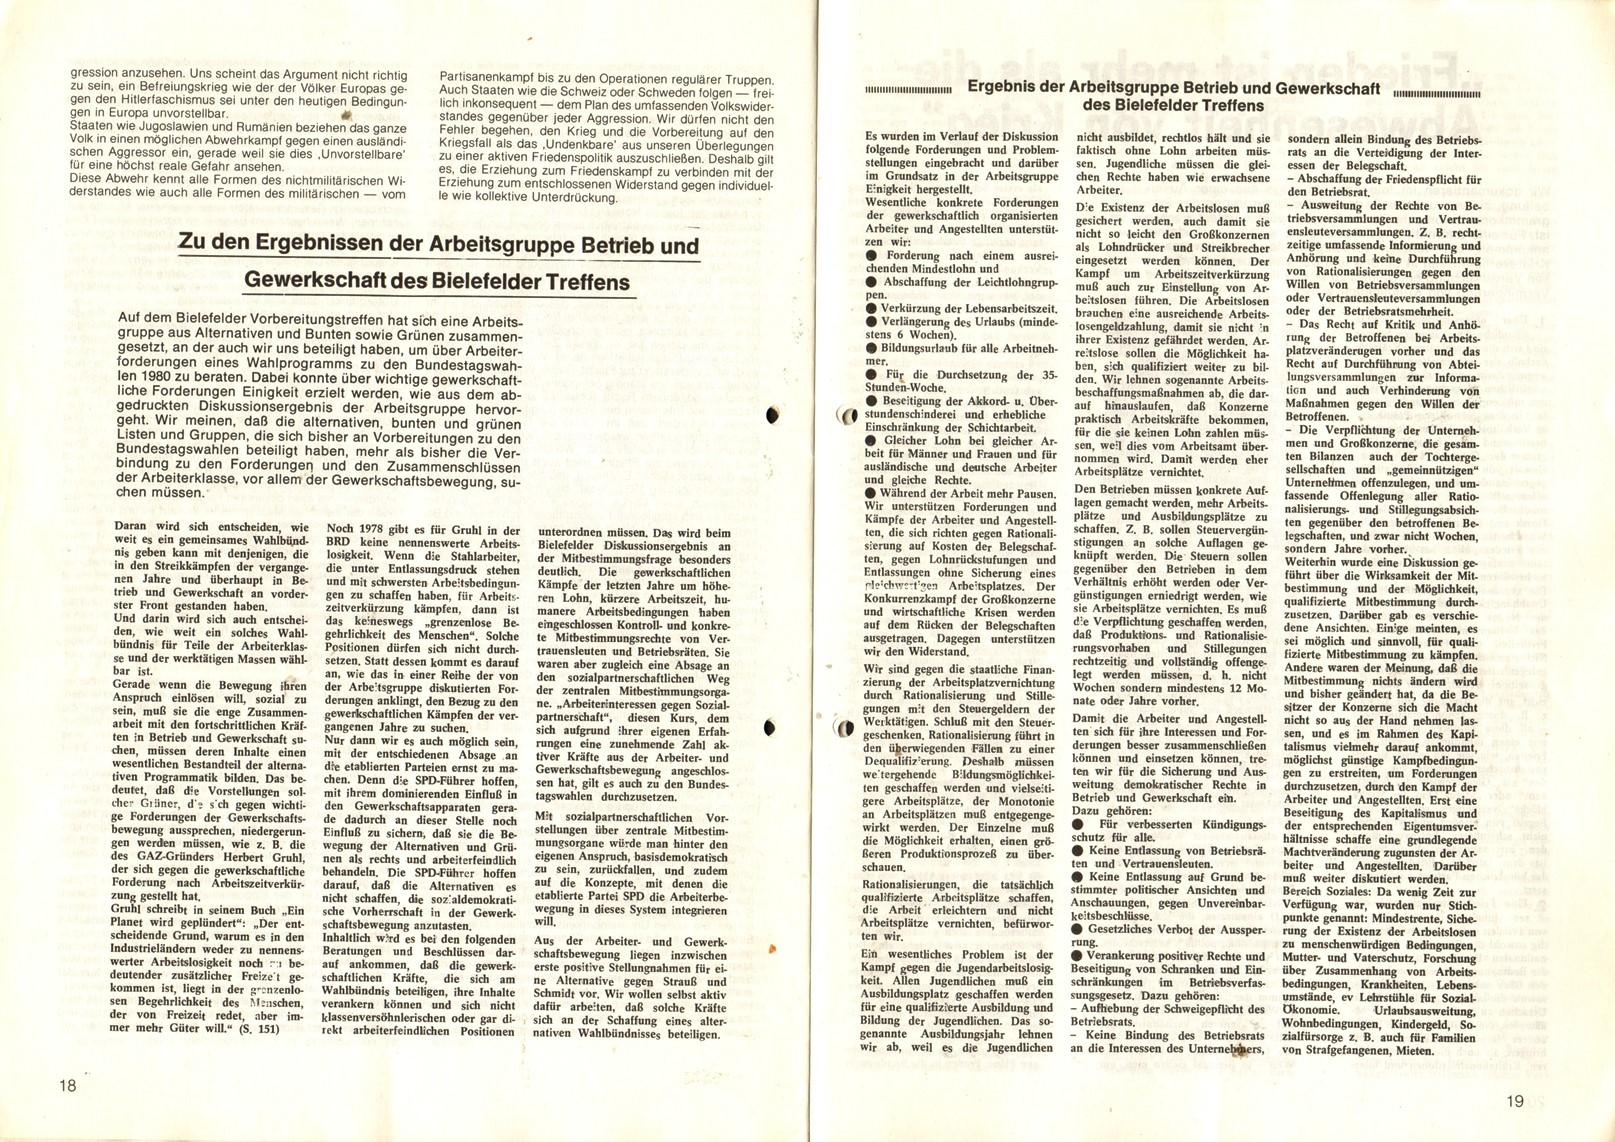 KPDAO_1979_Diskussion_Bundestagswahlen_1980_10